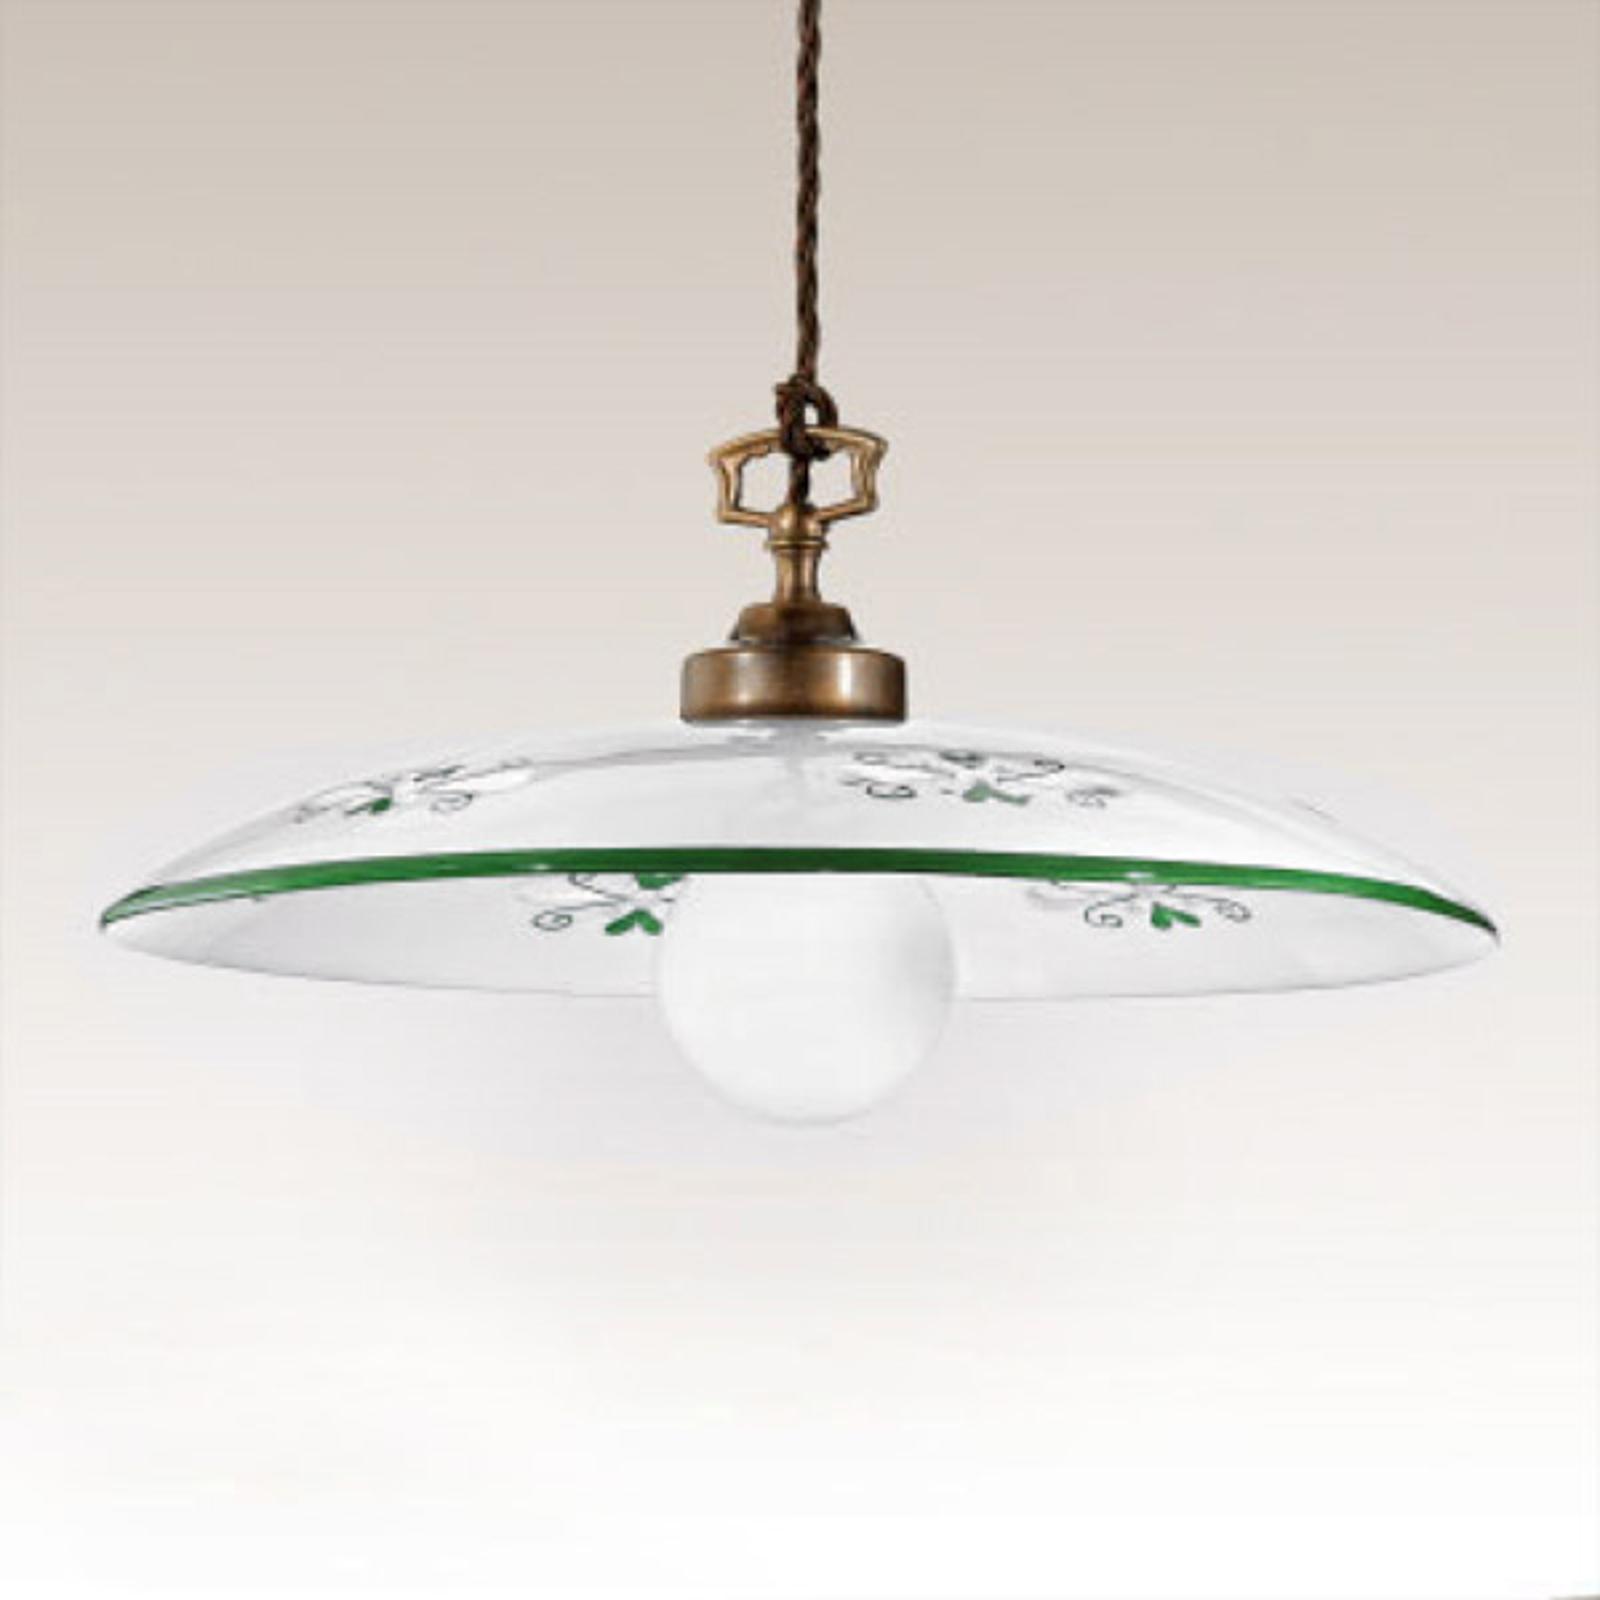 Smaakvolle hanglamp Bassano groen